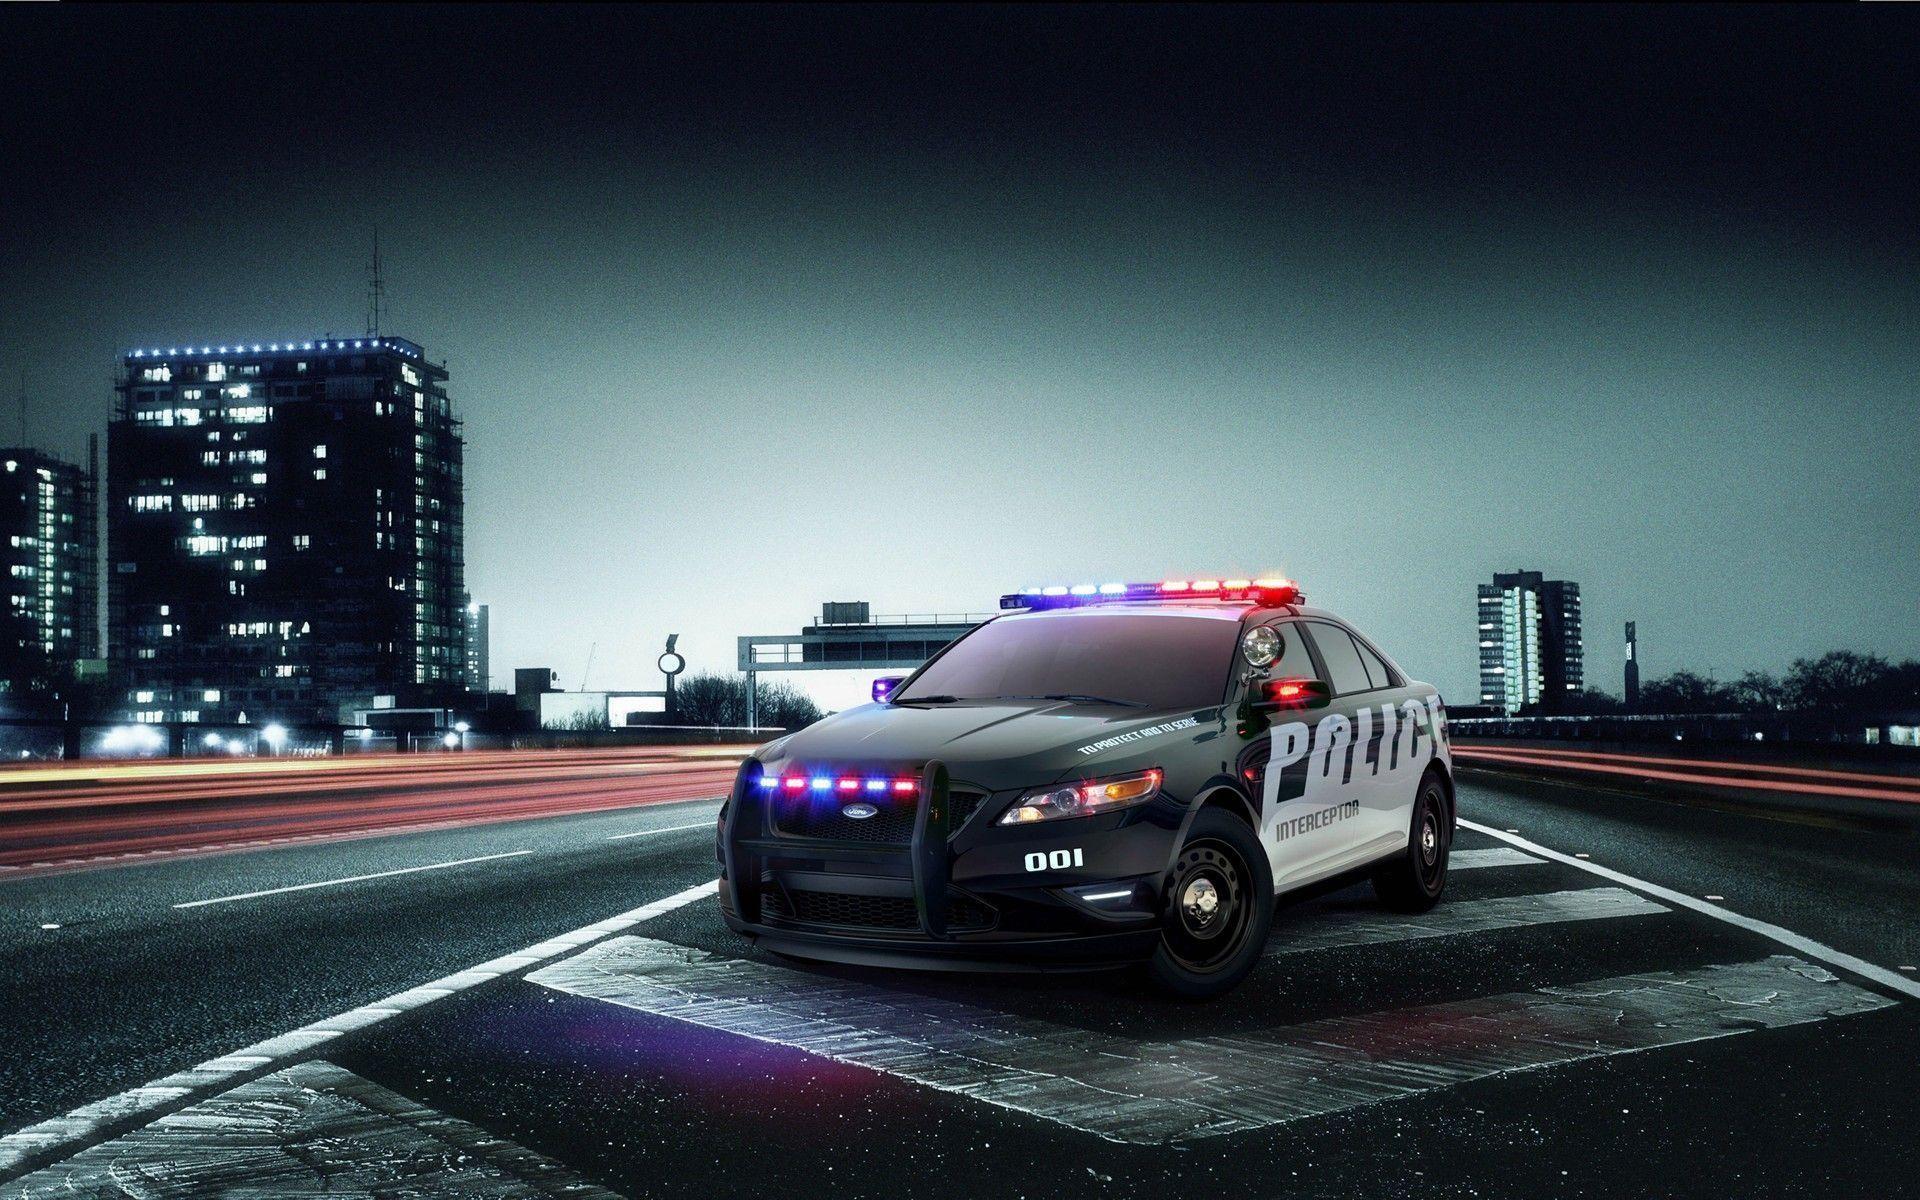 Police Officer Desktop Wallpaper – Viewing Gallery